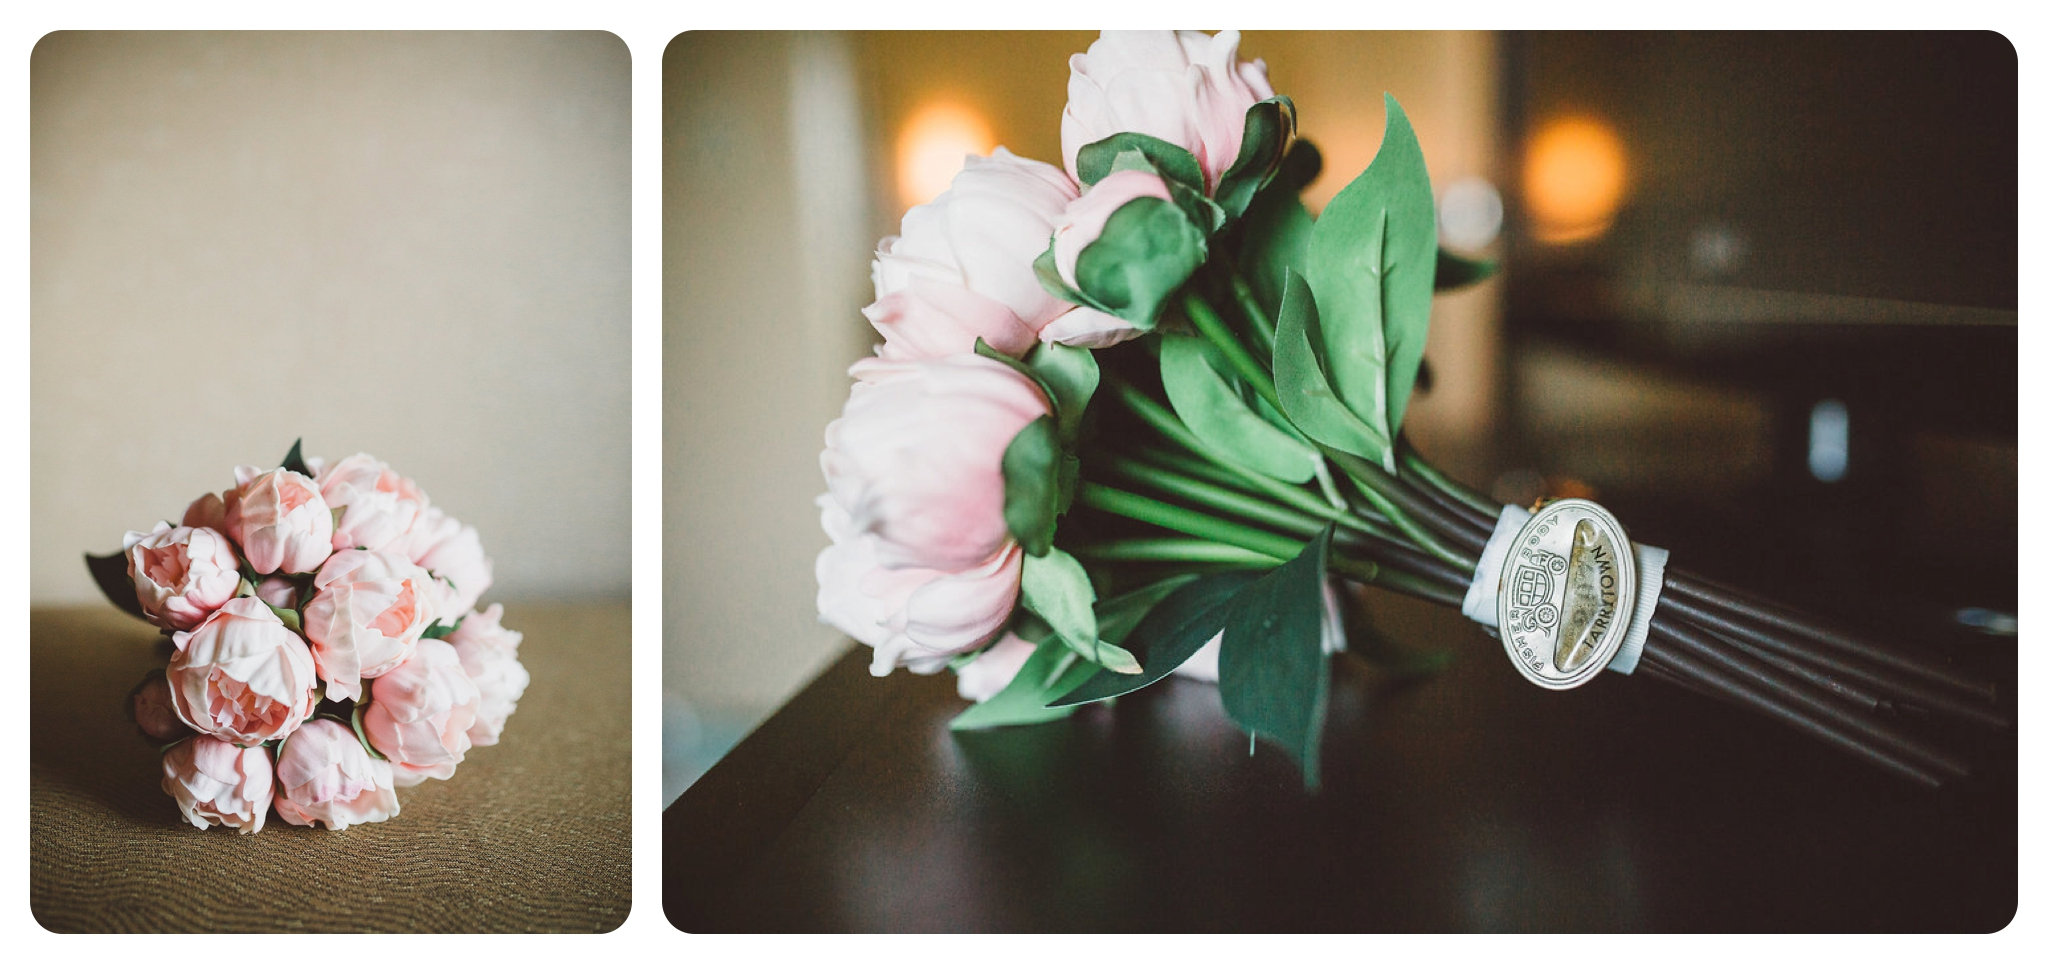 Braeloch-Weddings-Wedding-Photographer-Pat-Cori-Photography-002.jpg